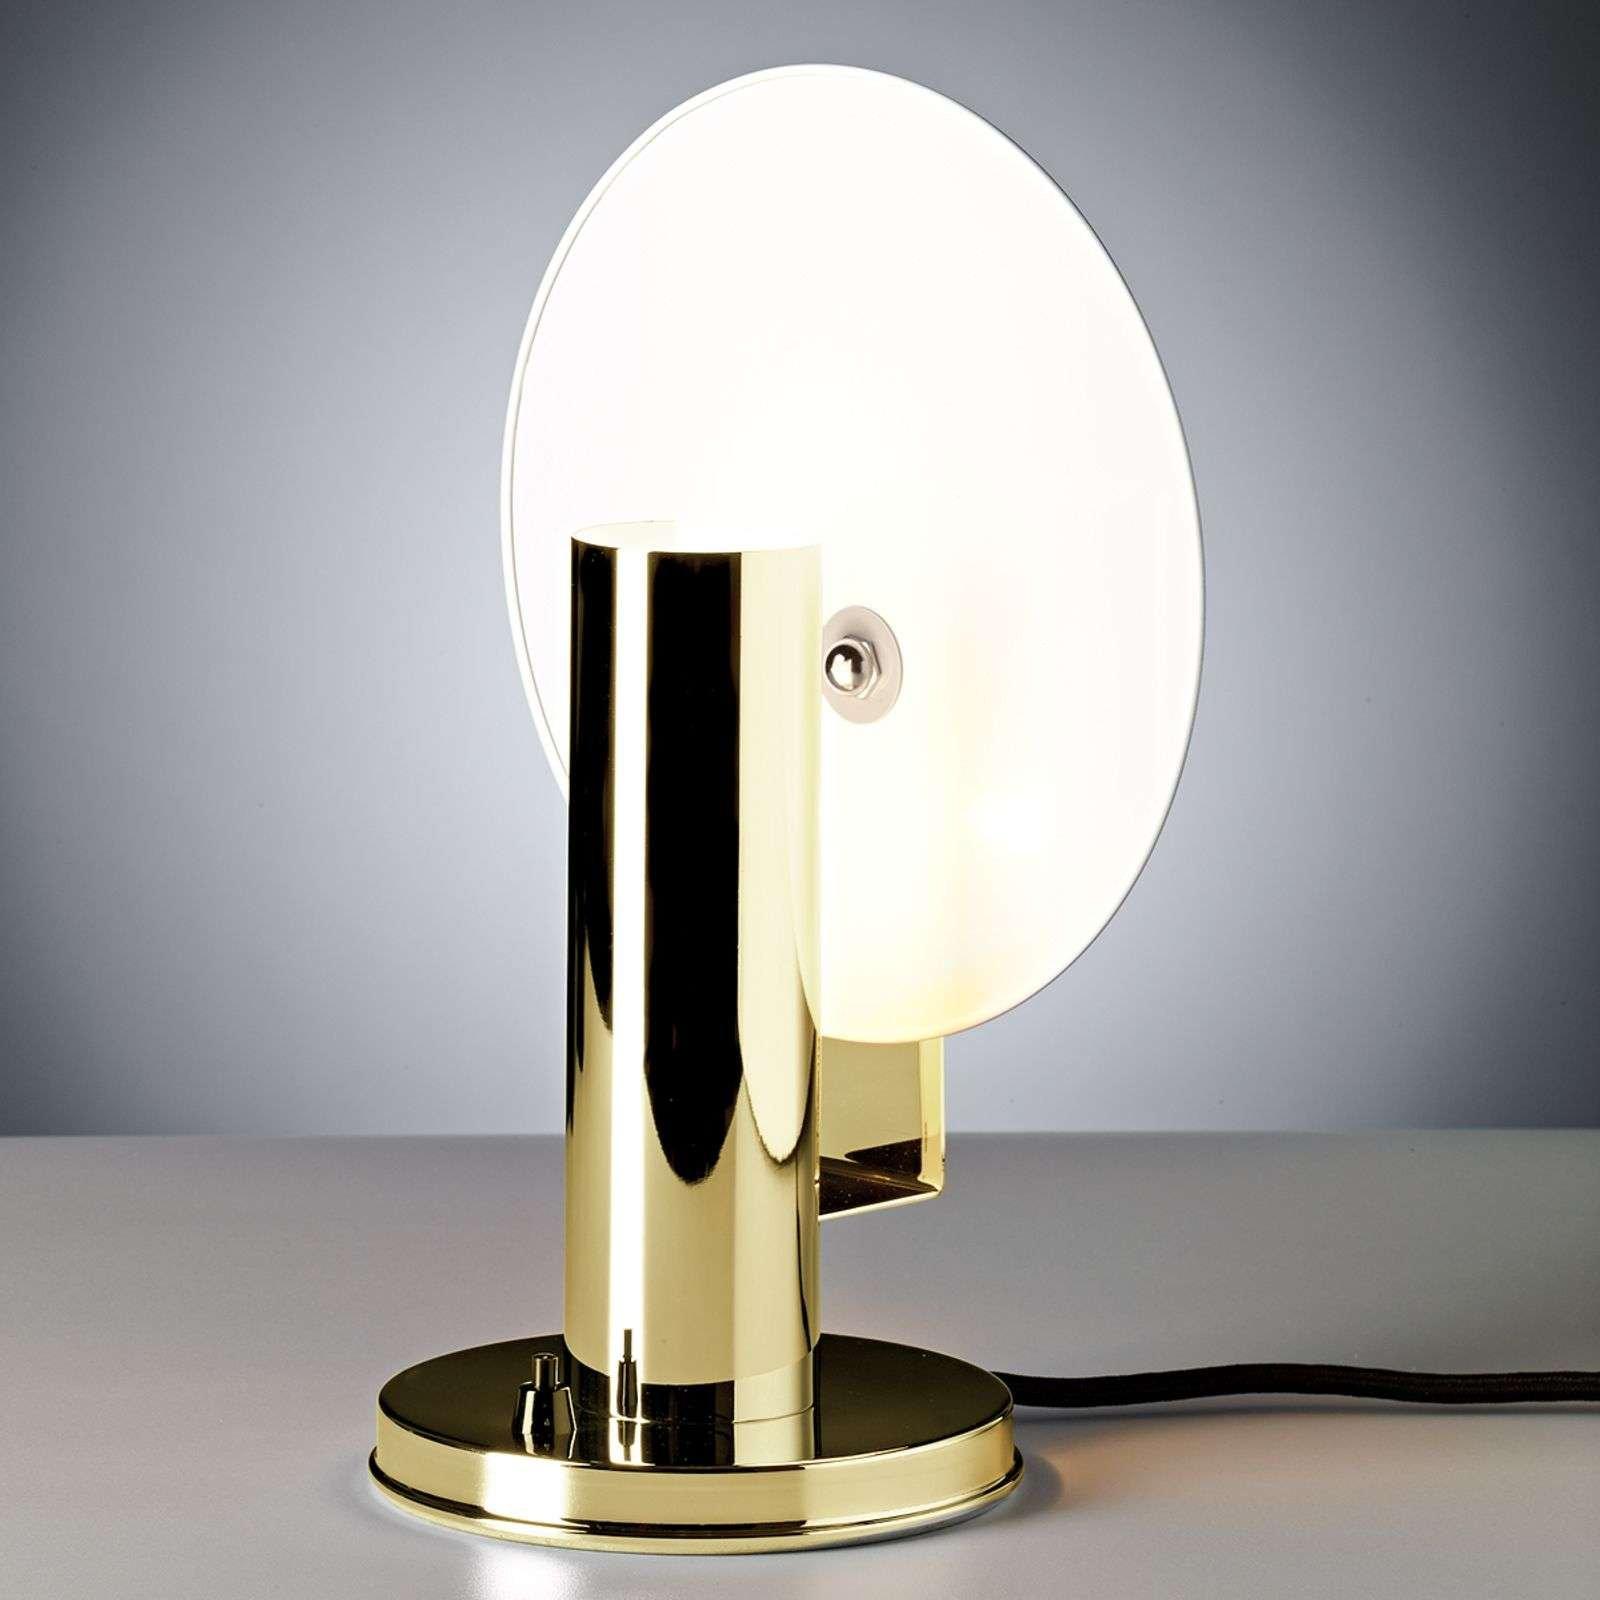 De Stijl table lamp made of brass